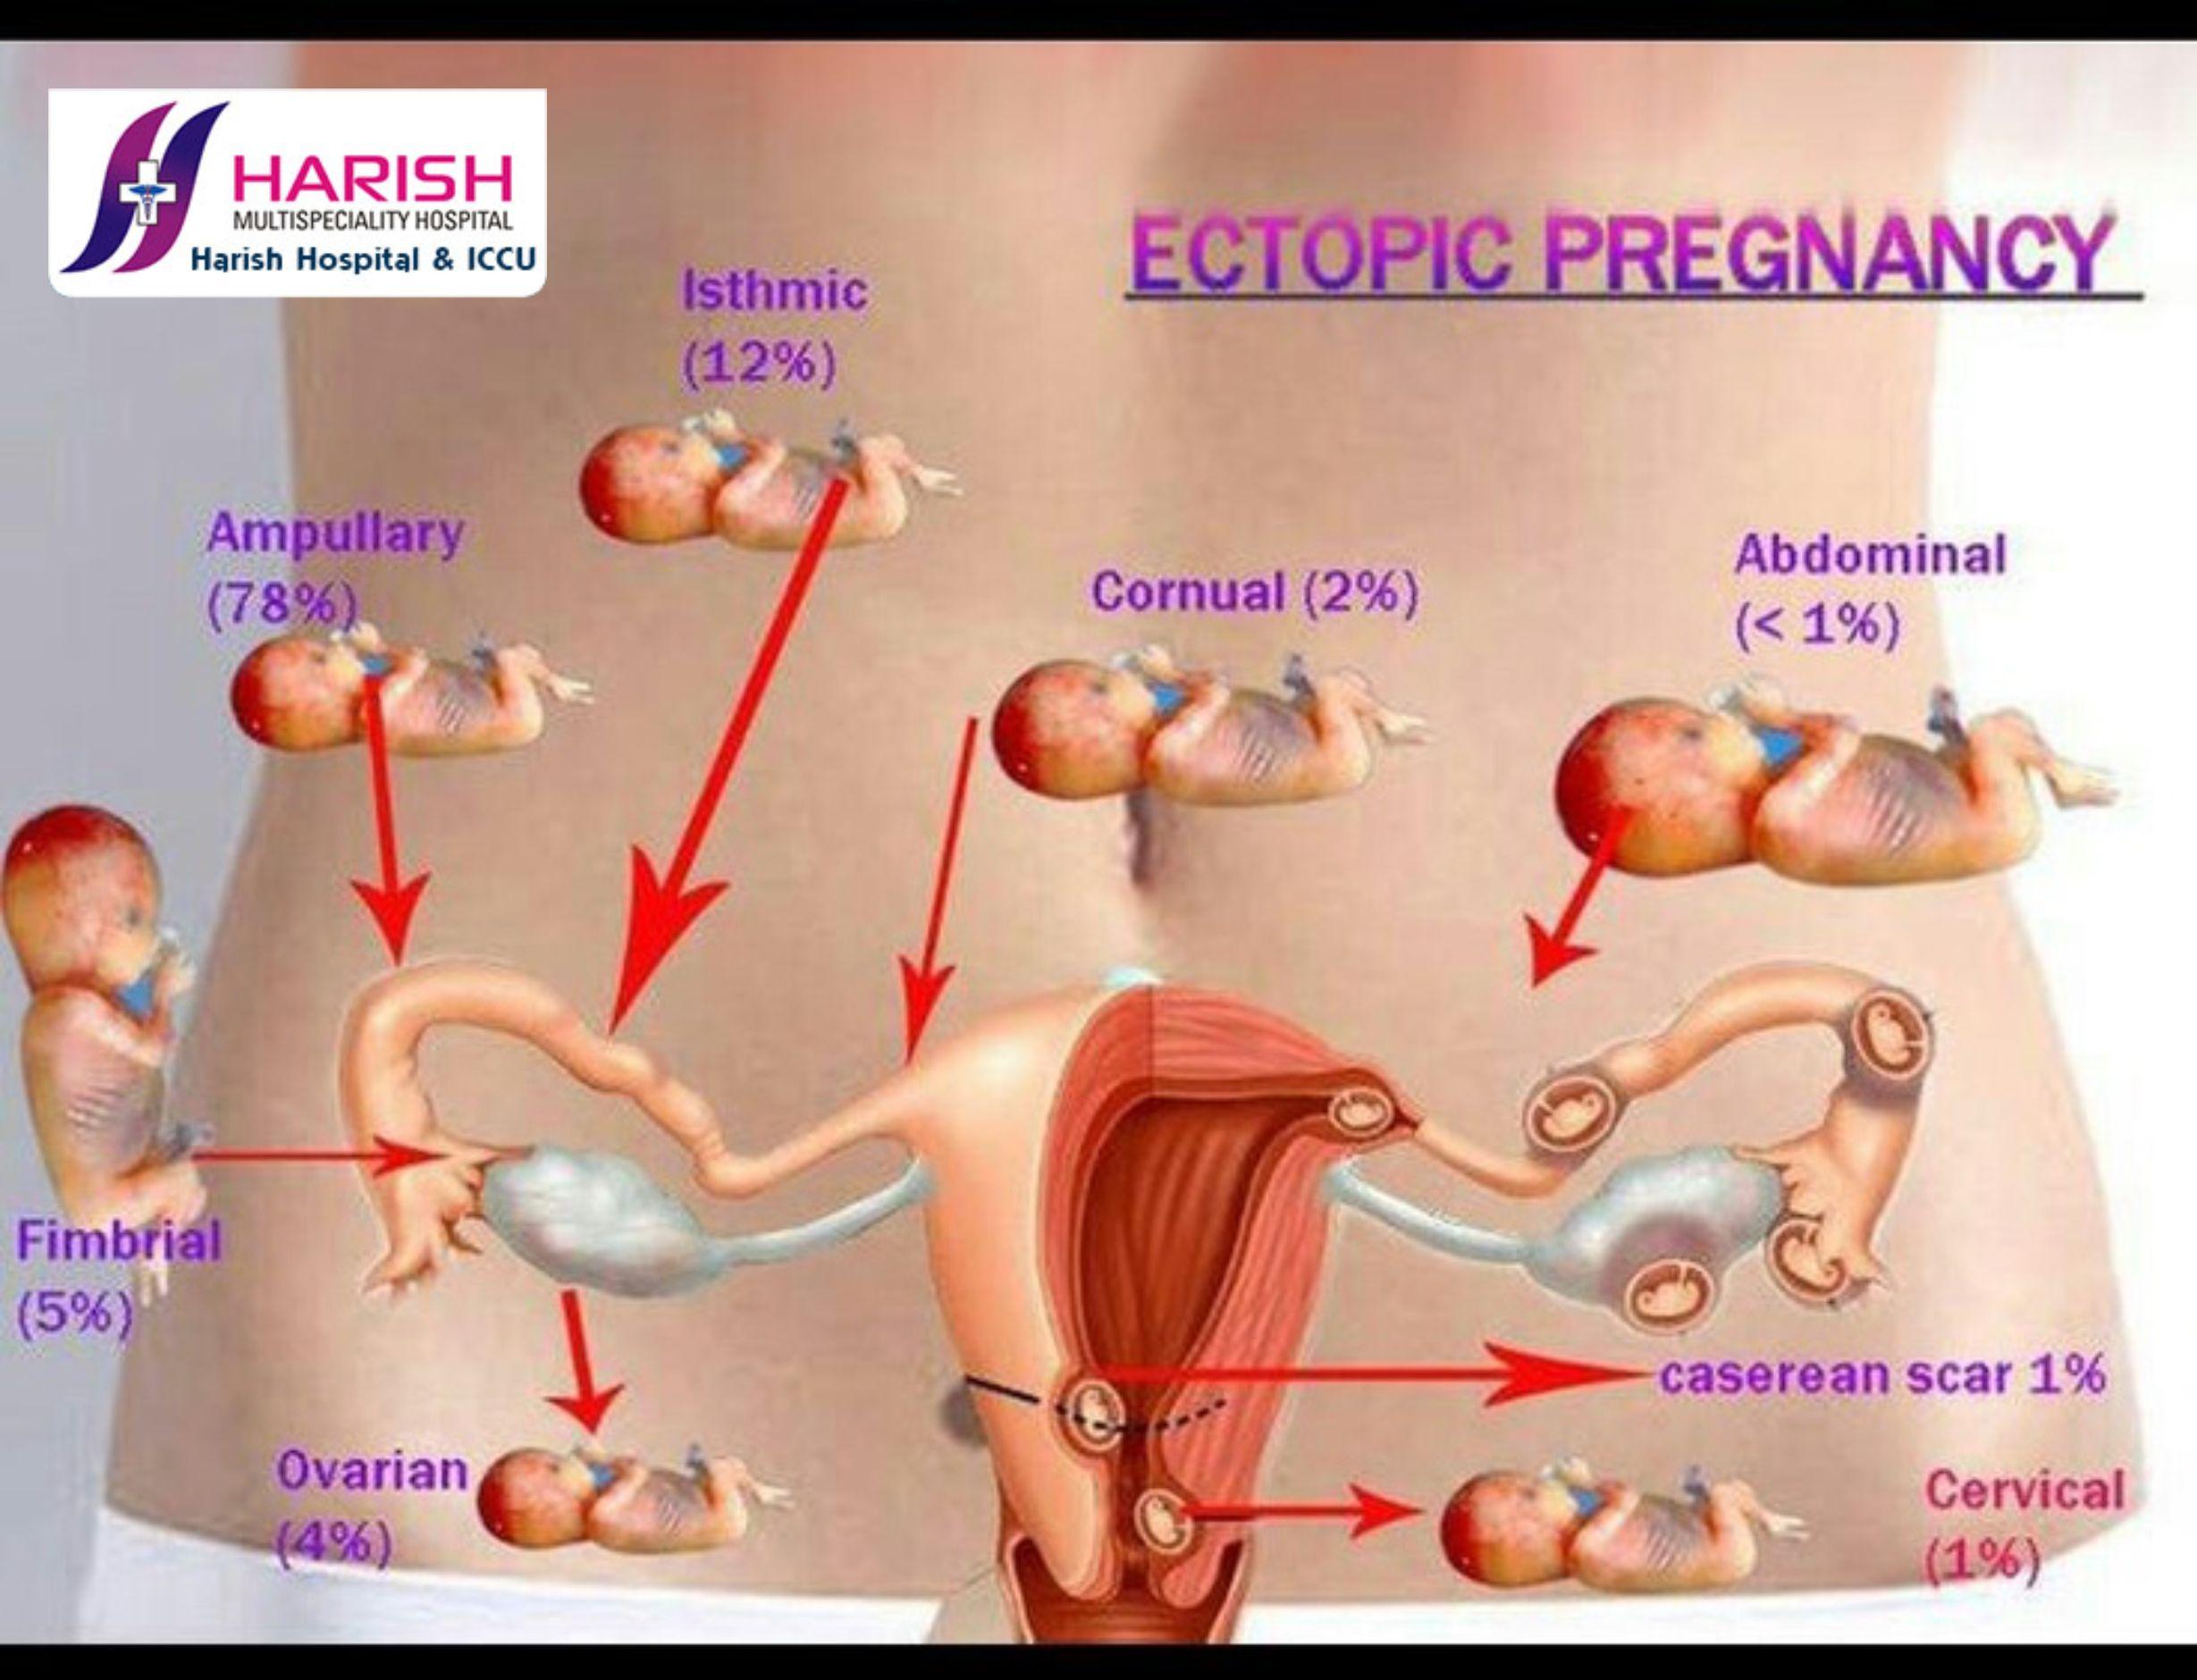 Pin by harish hospital nerul on Ectopic pregnancy | Pinterest ...